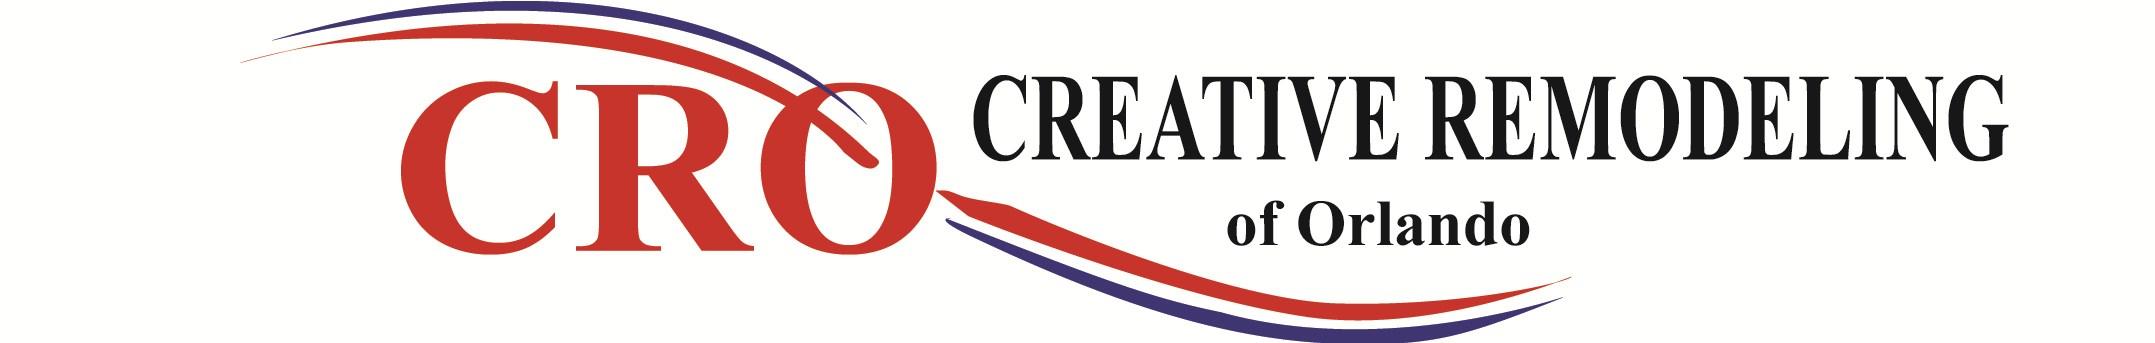 Creative Remodeling of Orlando logo